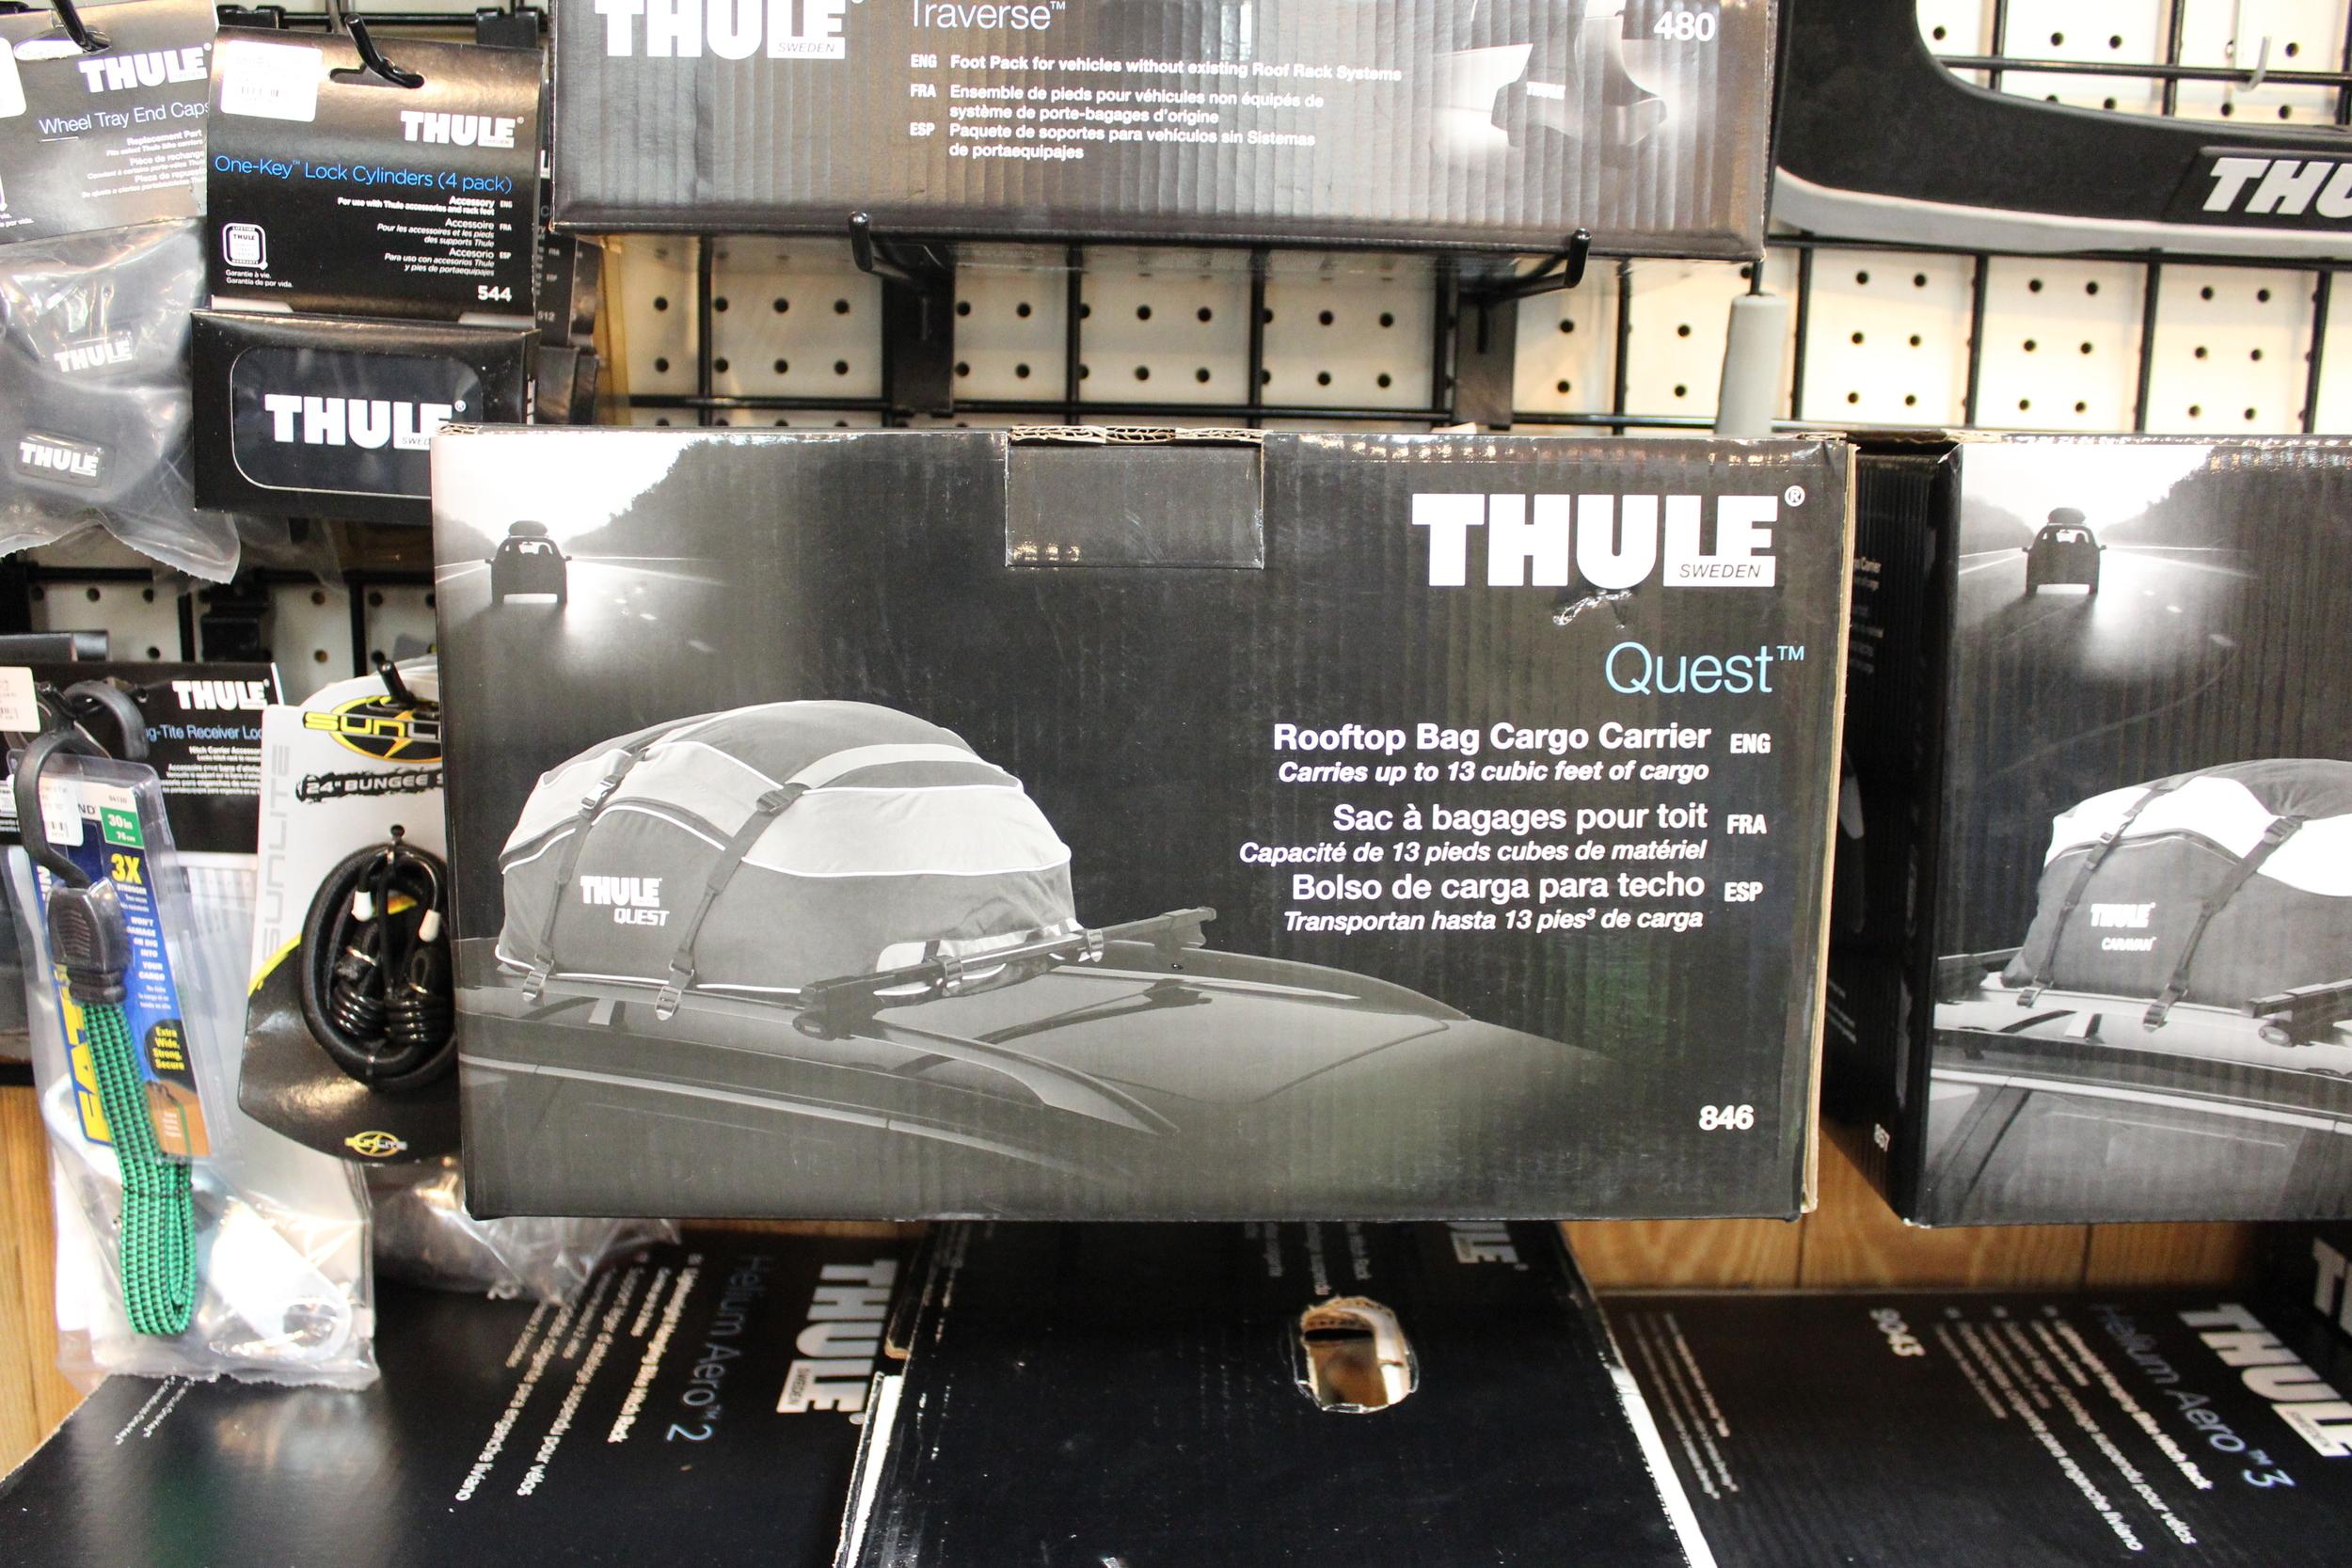 Thule Roof Rack Options